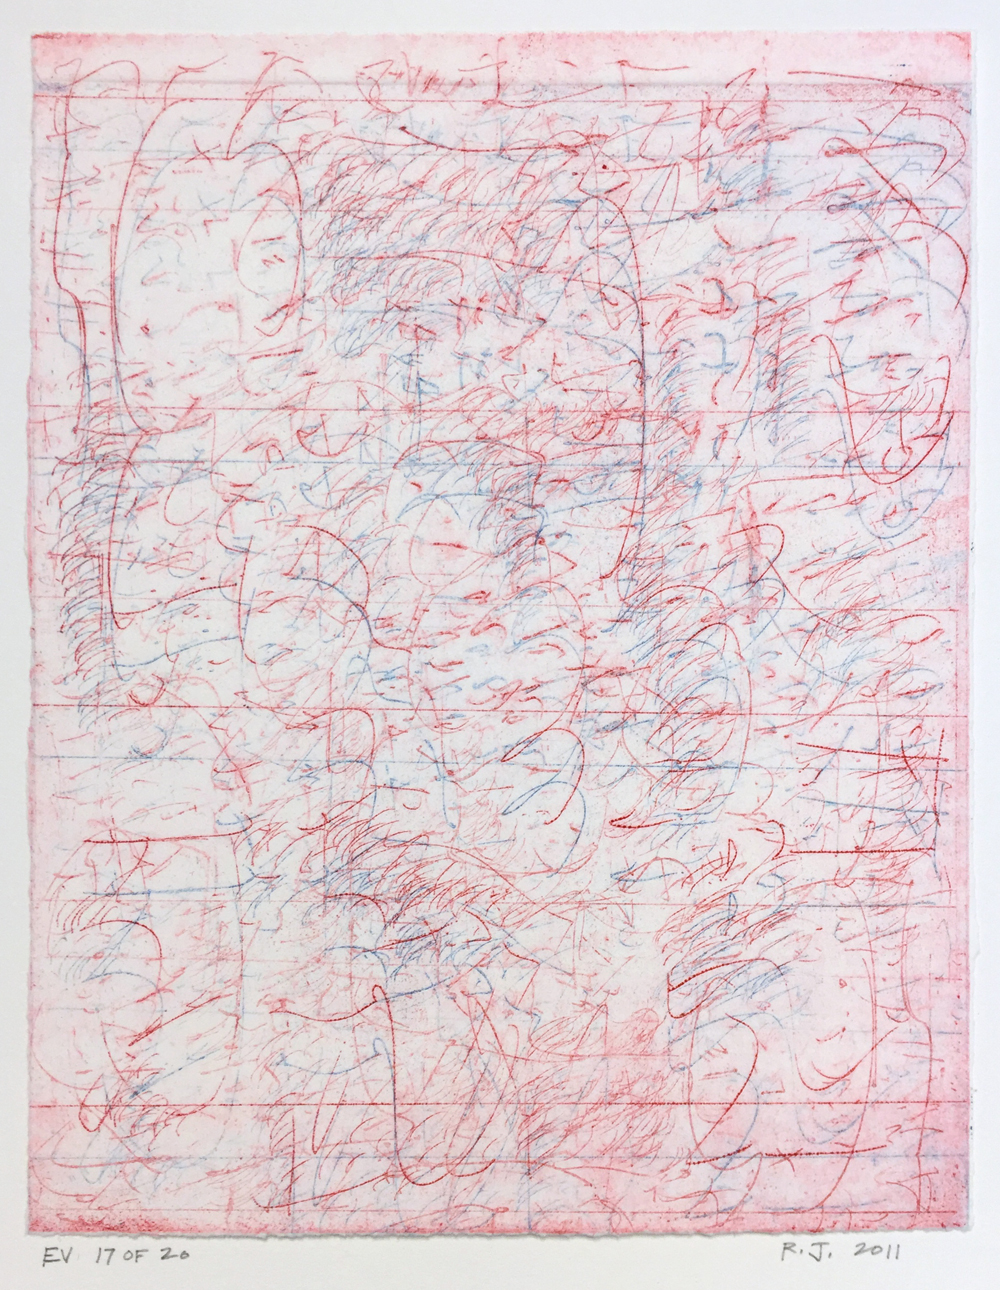 Robert C. Jones, EV, 2011, edition 17/20, etching, 10 x 7.75 inches, $600.